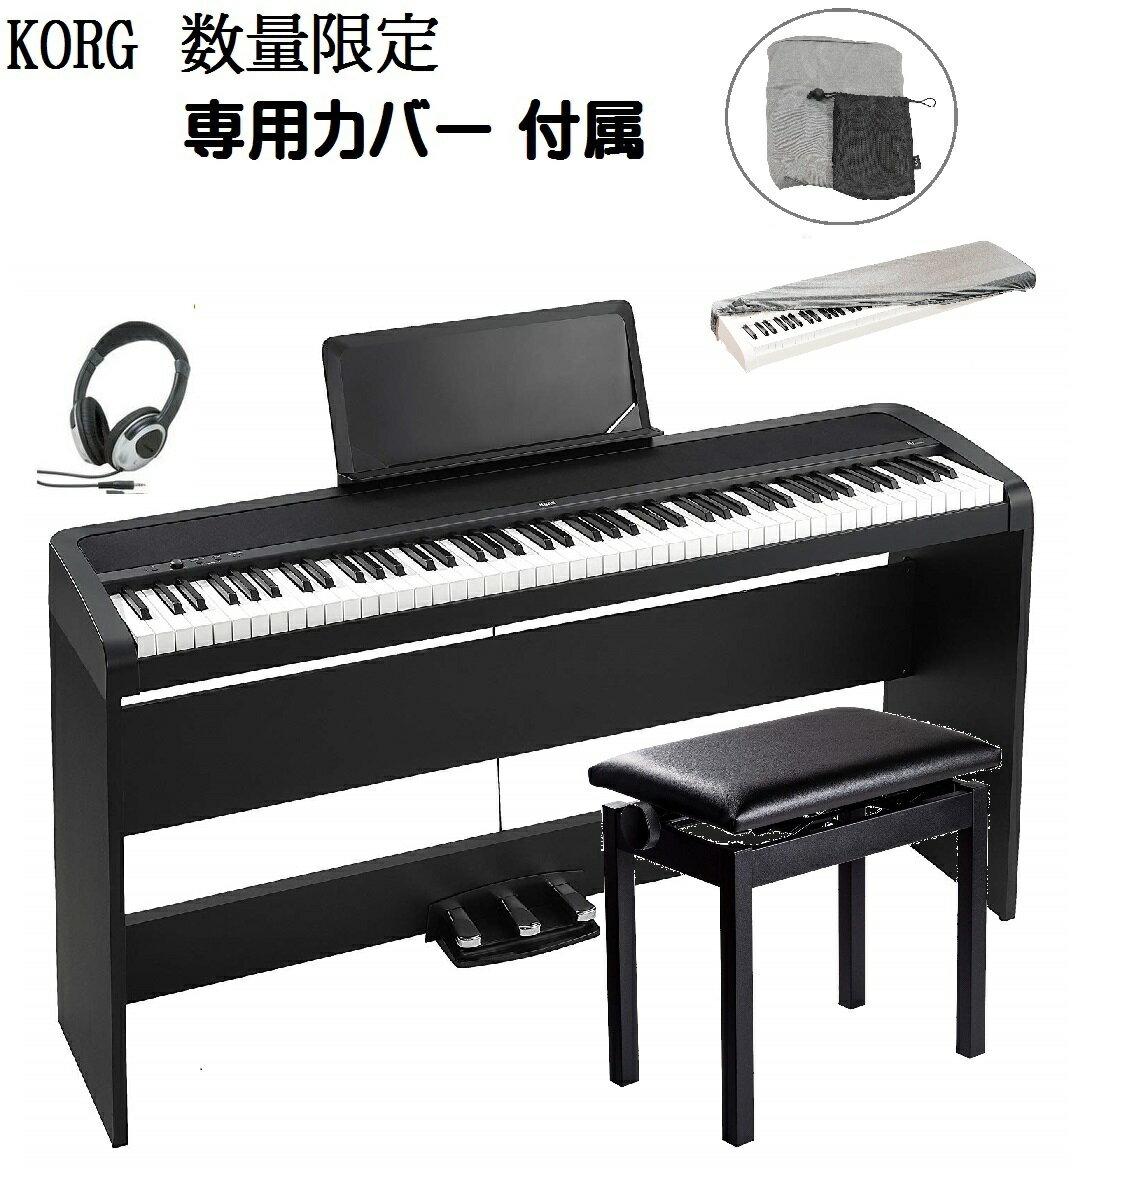 KORG B1SP BK コルグ 電子ピアノ ブラック 専用スタンド STB1 3本ペダル 高低椅子 ヘッドホン 数量限定 専用カバー 付属